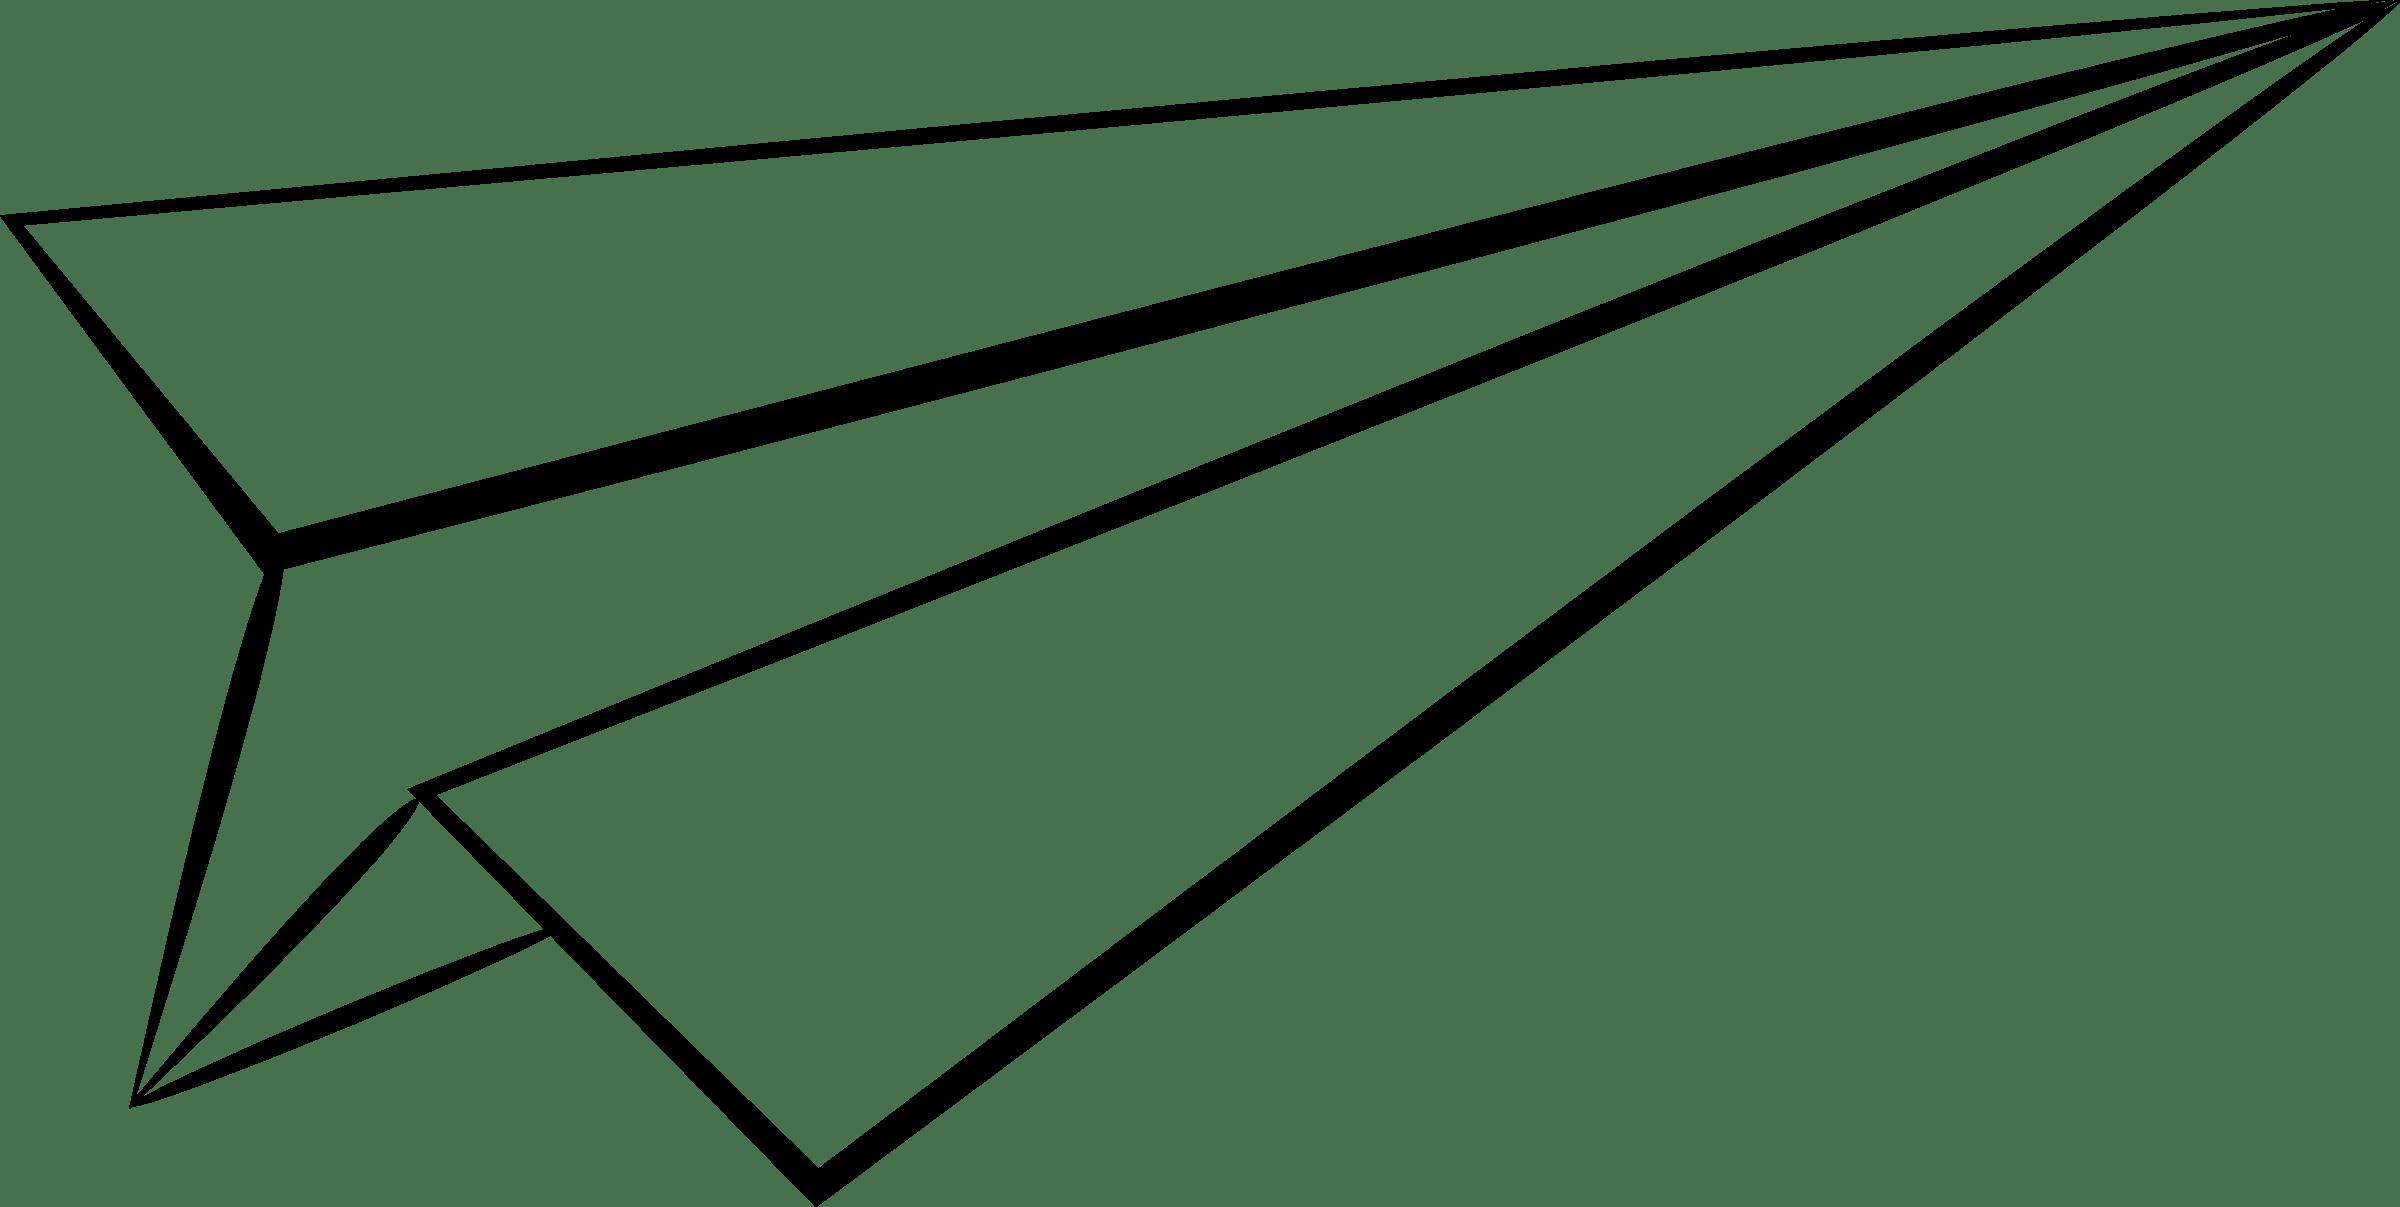 Paper Airplane Drawing Clipart Panda